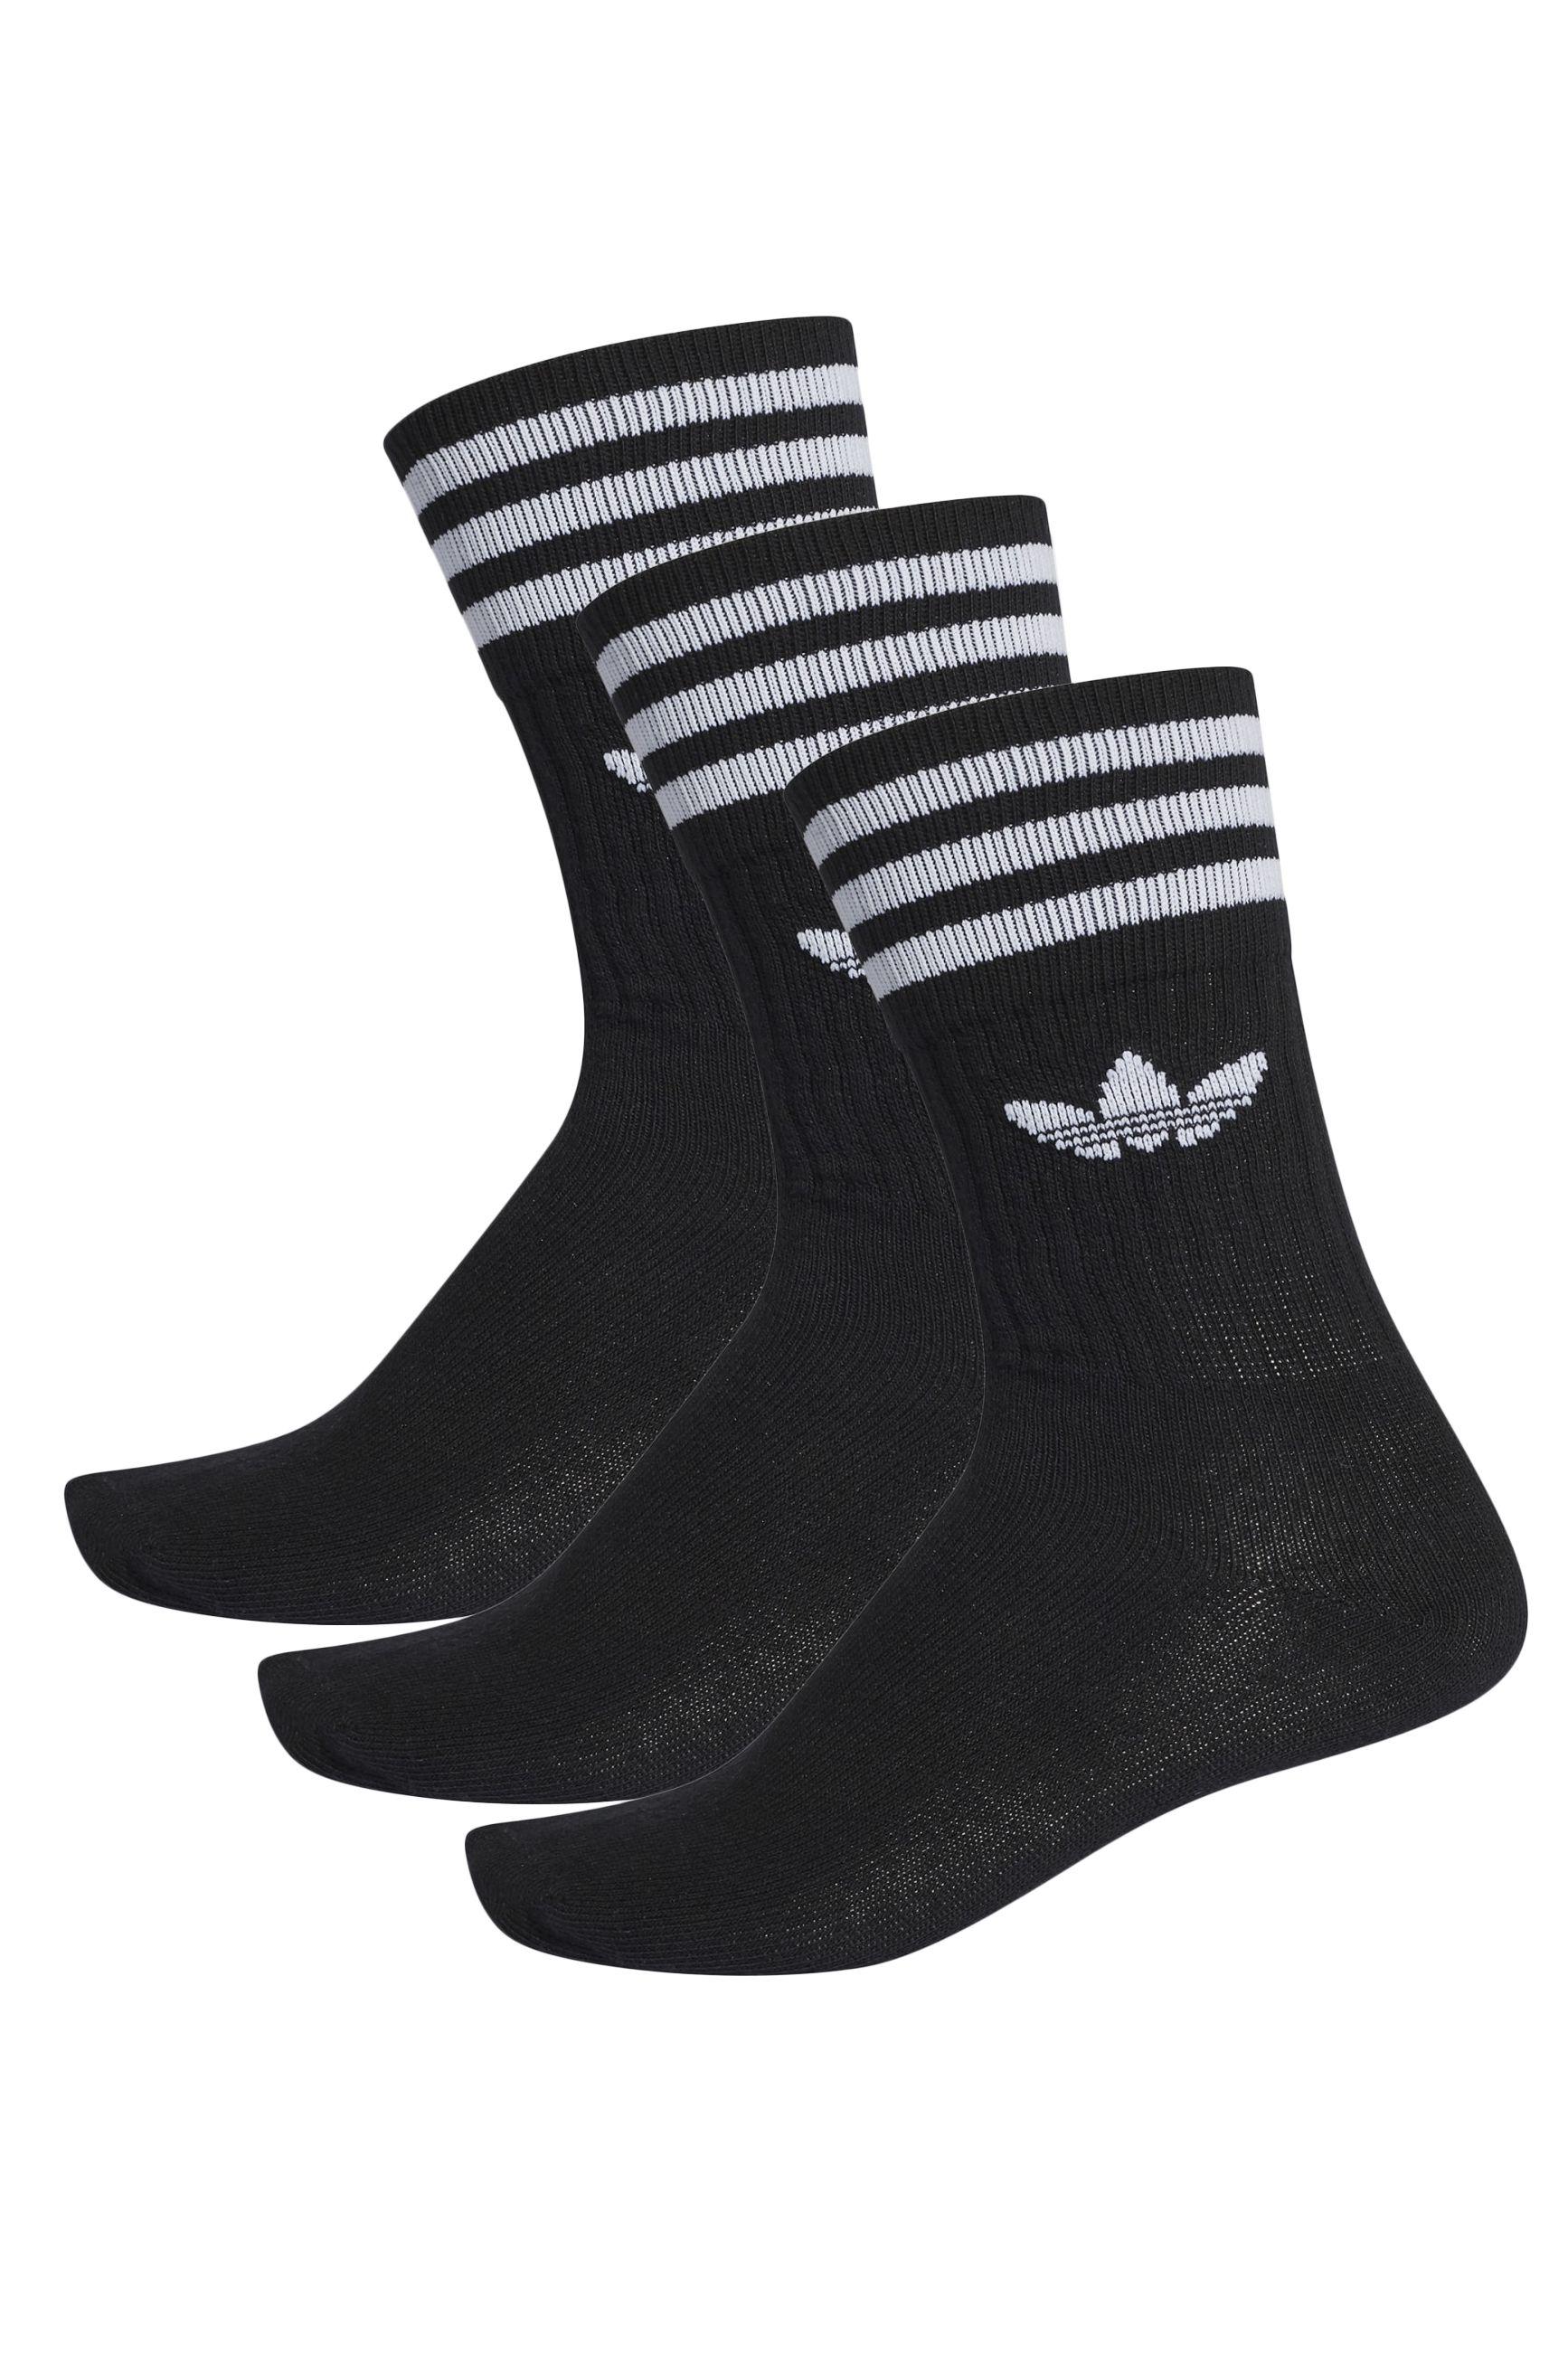 Adidas Socks SOLID CREW SOCK Black/White